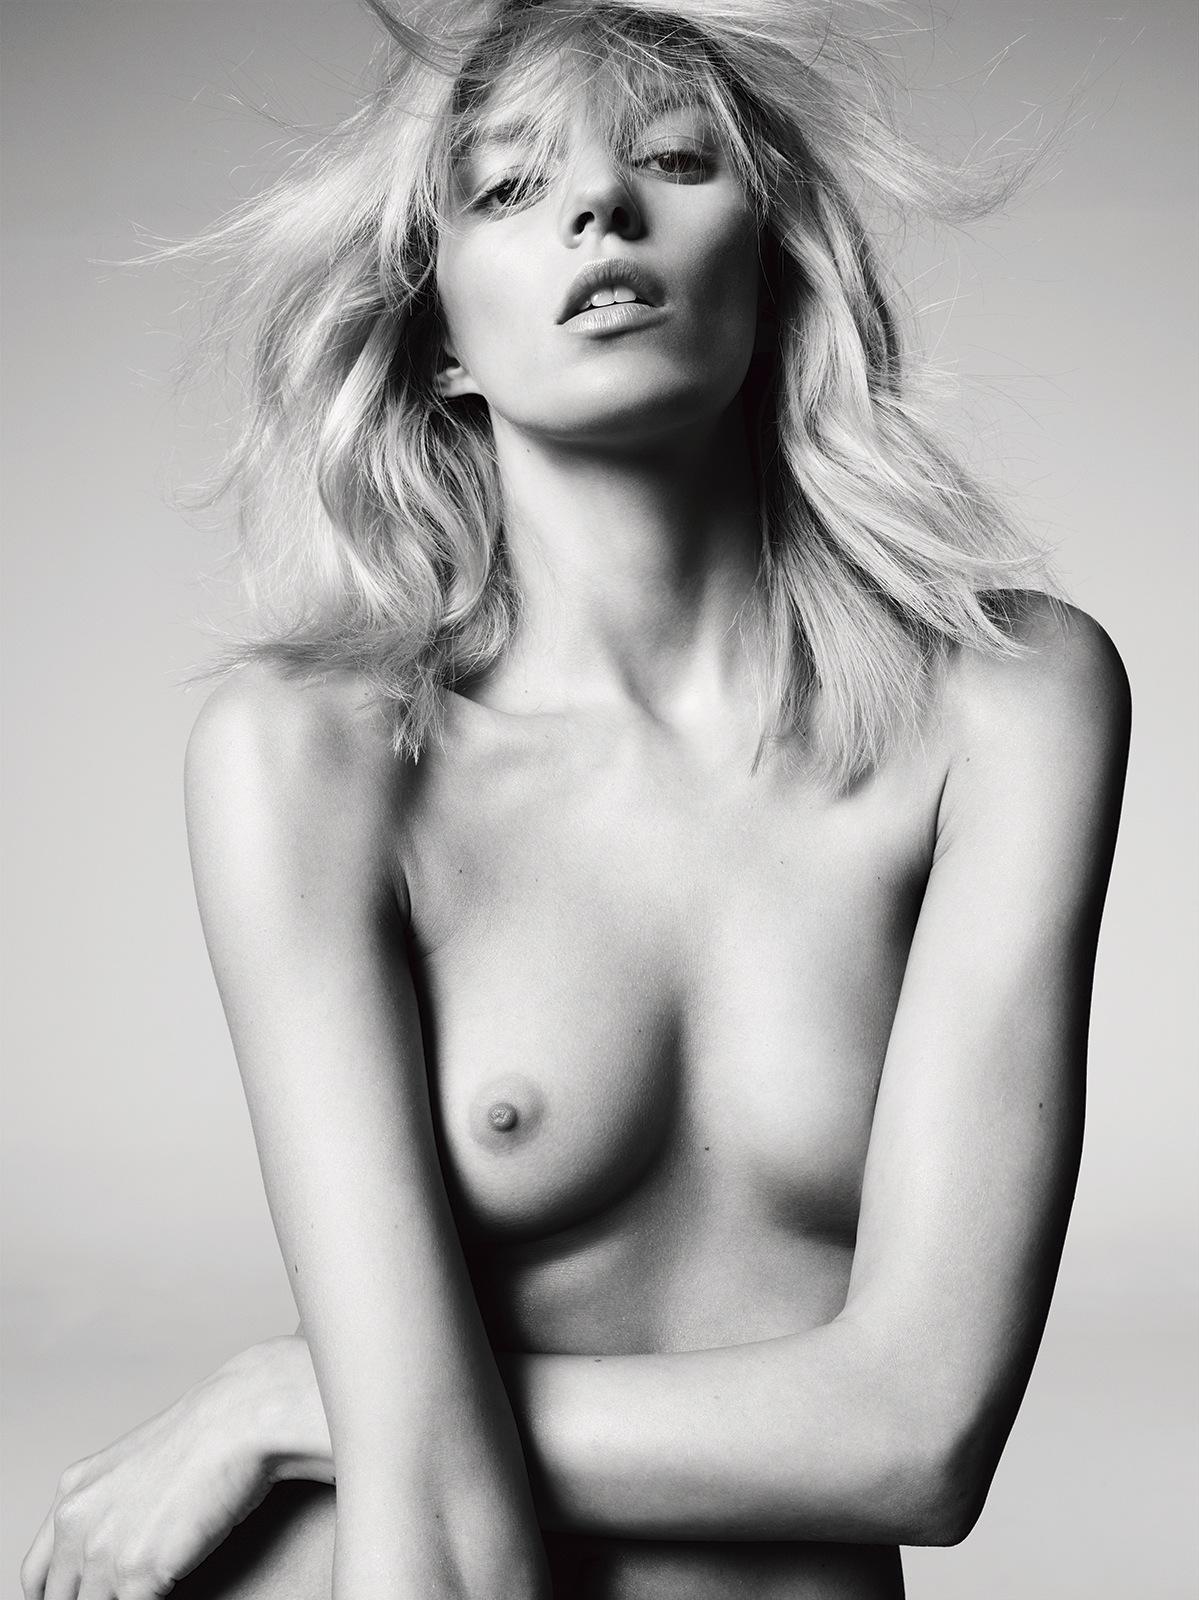 Anja_Rubik-Jan_Welters-Elle.jpeg